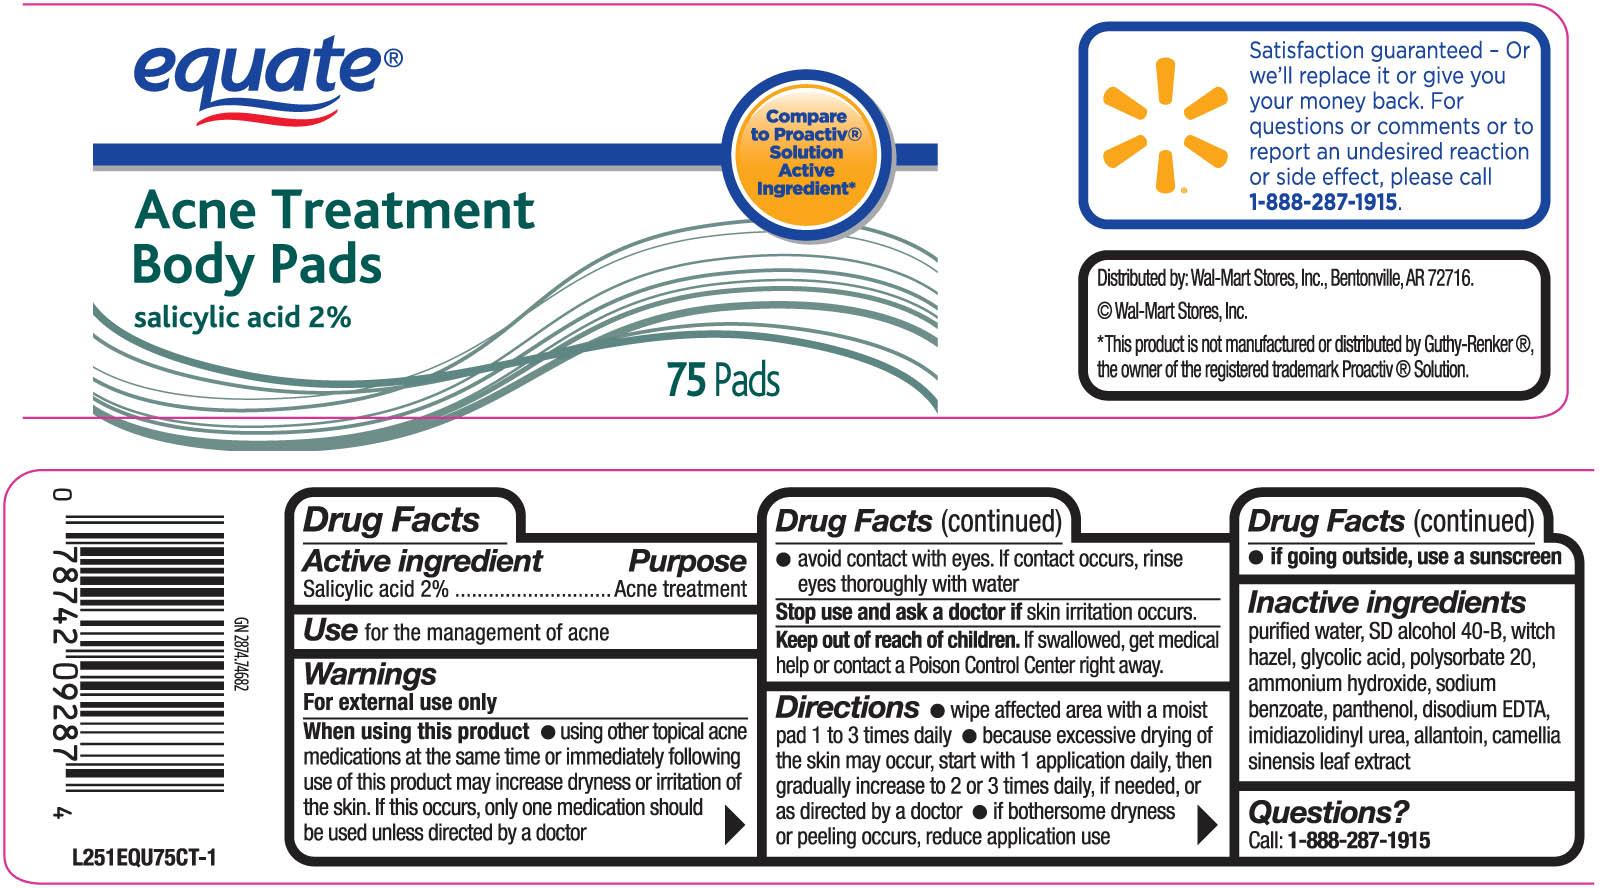 Equate Acne Treatment Body Pads (Salicylic Acid) Swab [Wal-mart Stores Inc]